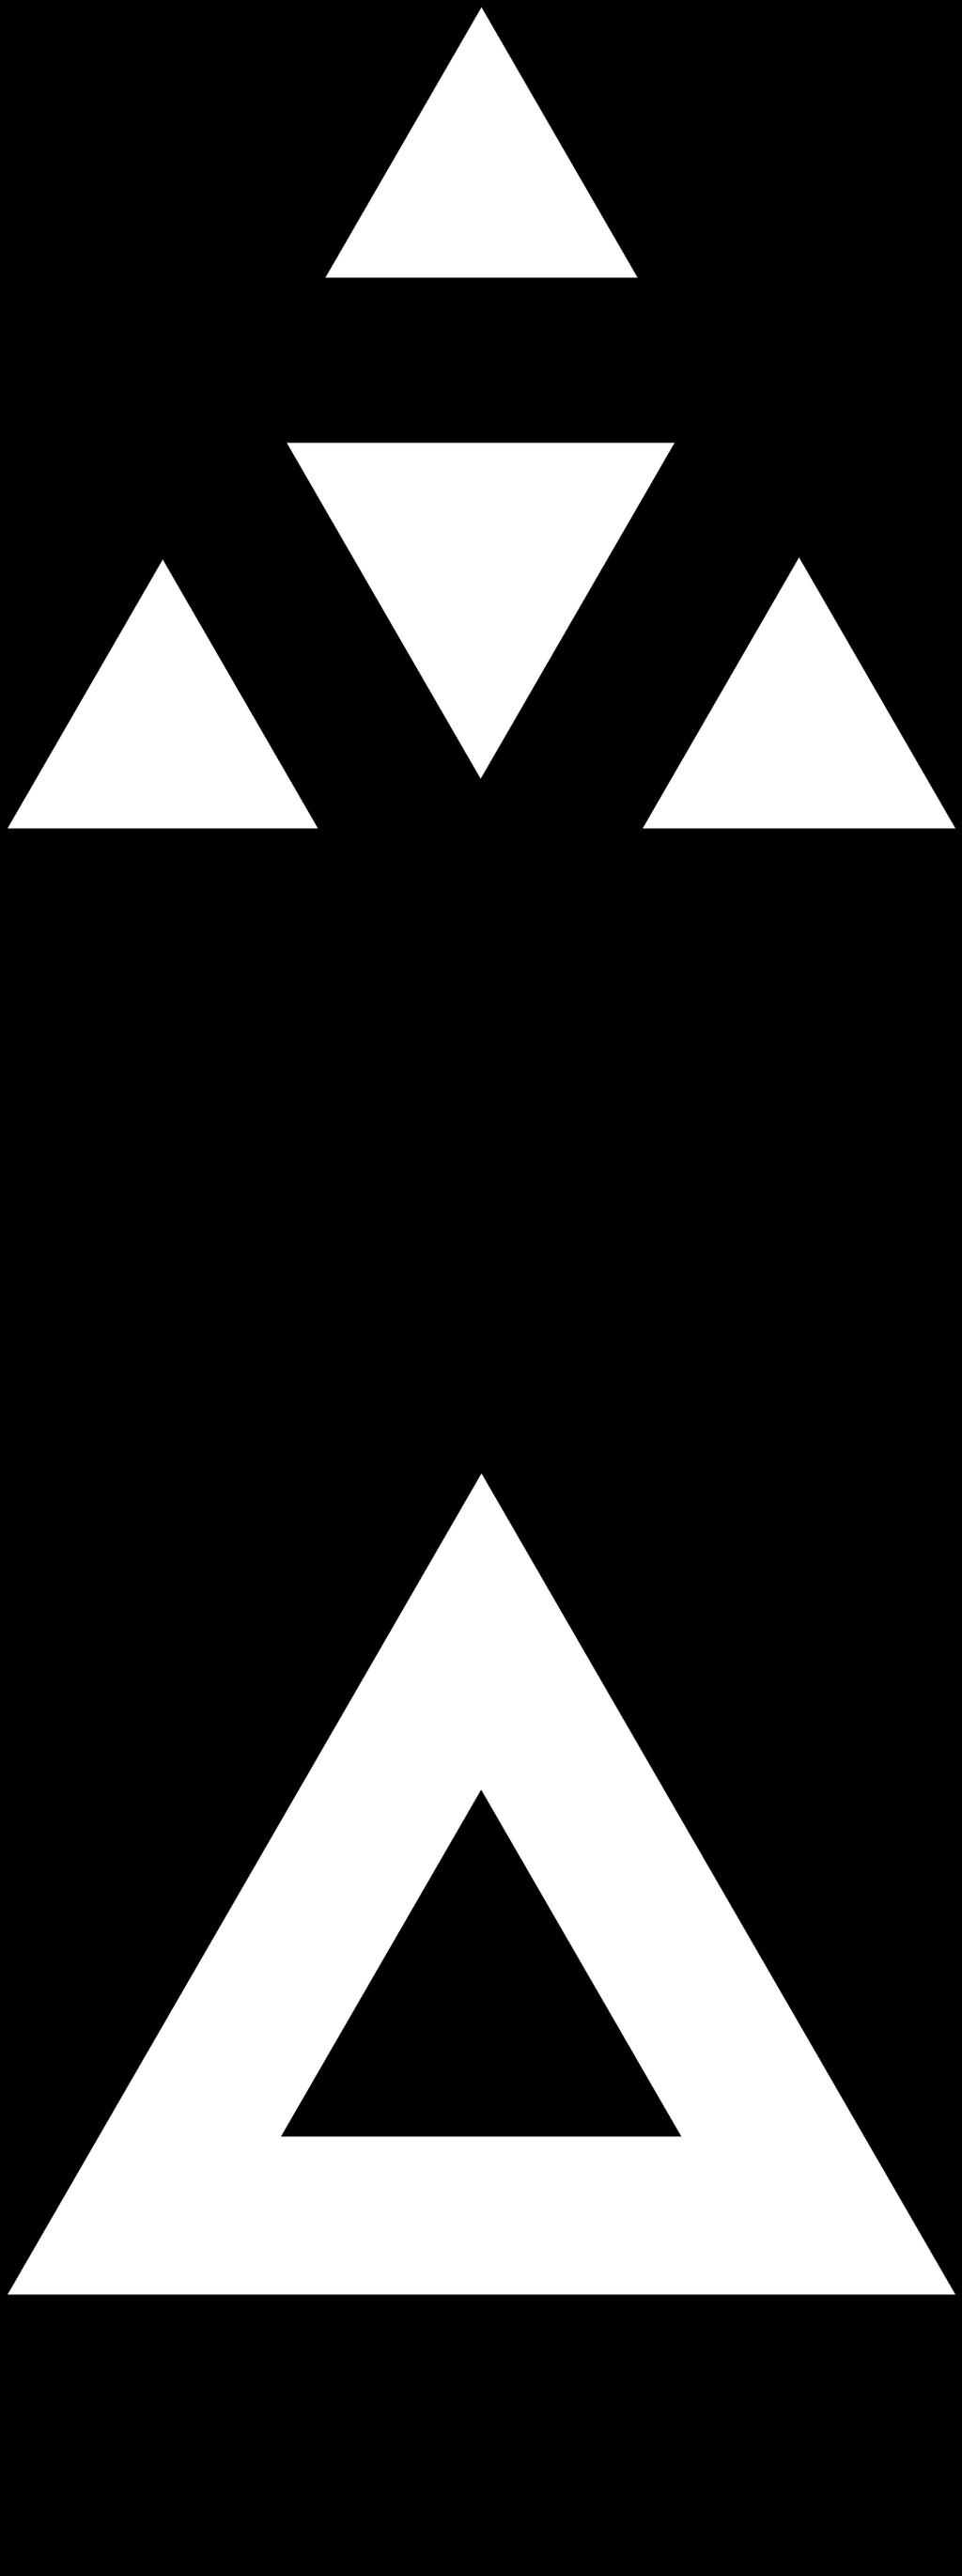 Yin And Yang Symbols By Fluffyxai On Deviantart